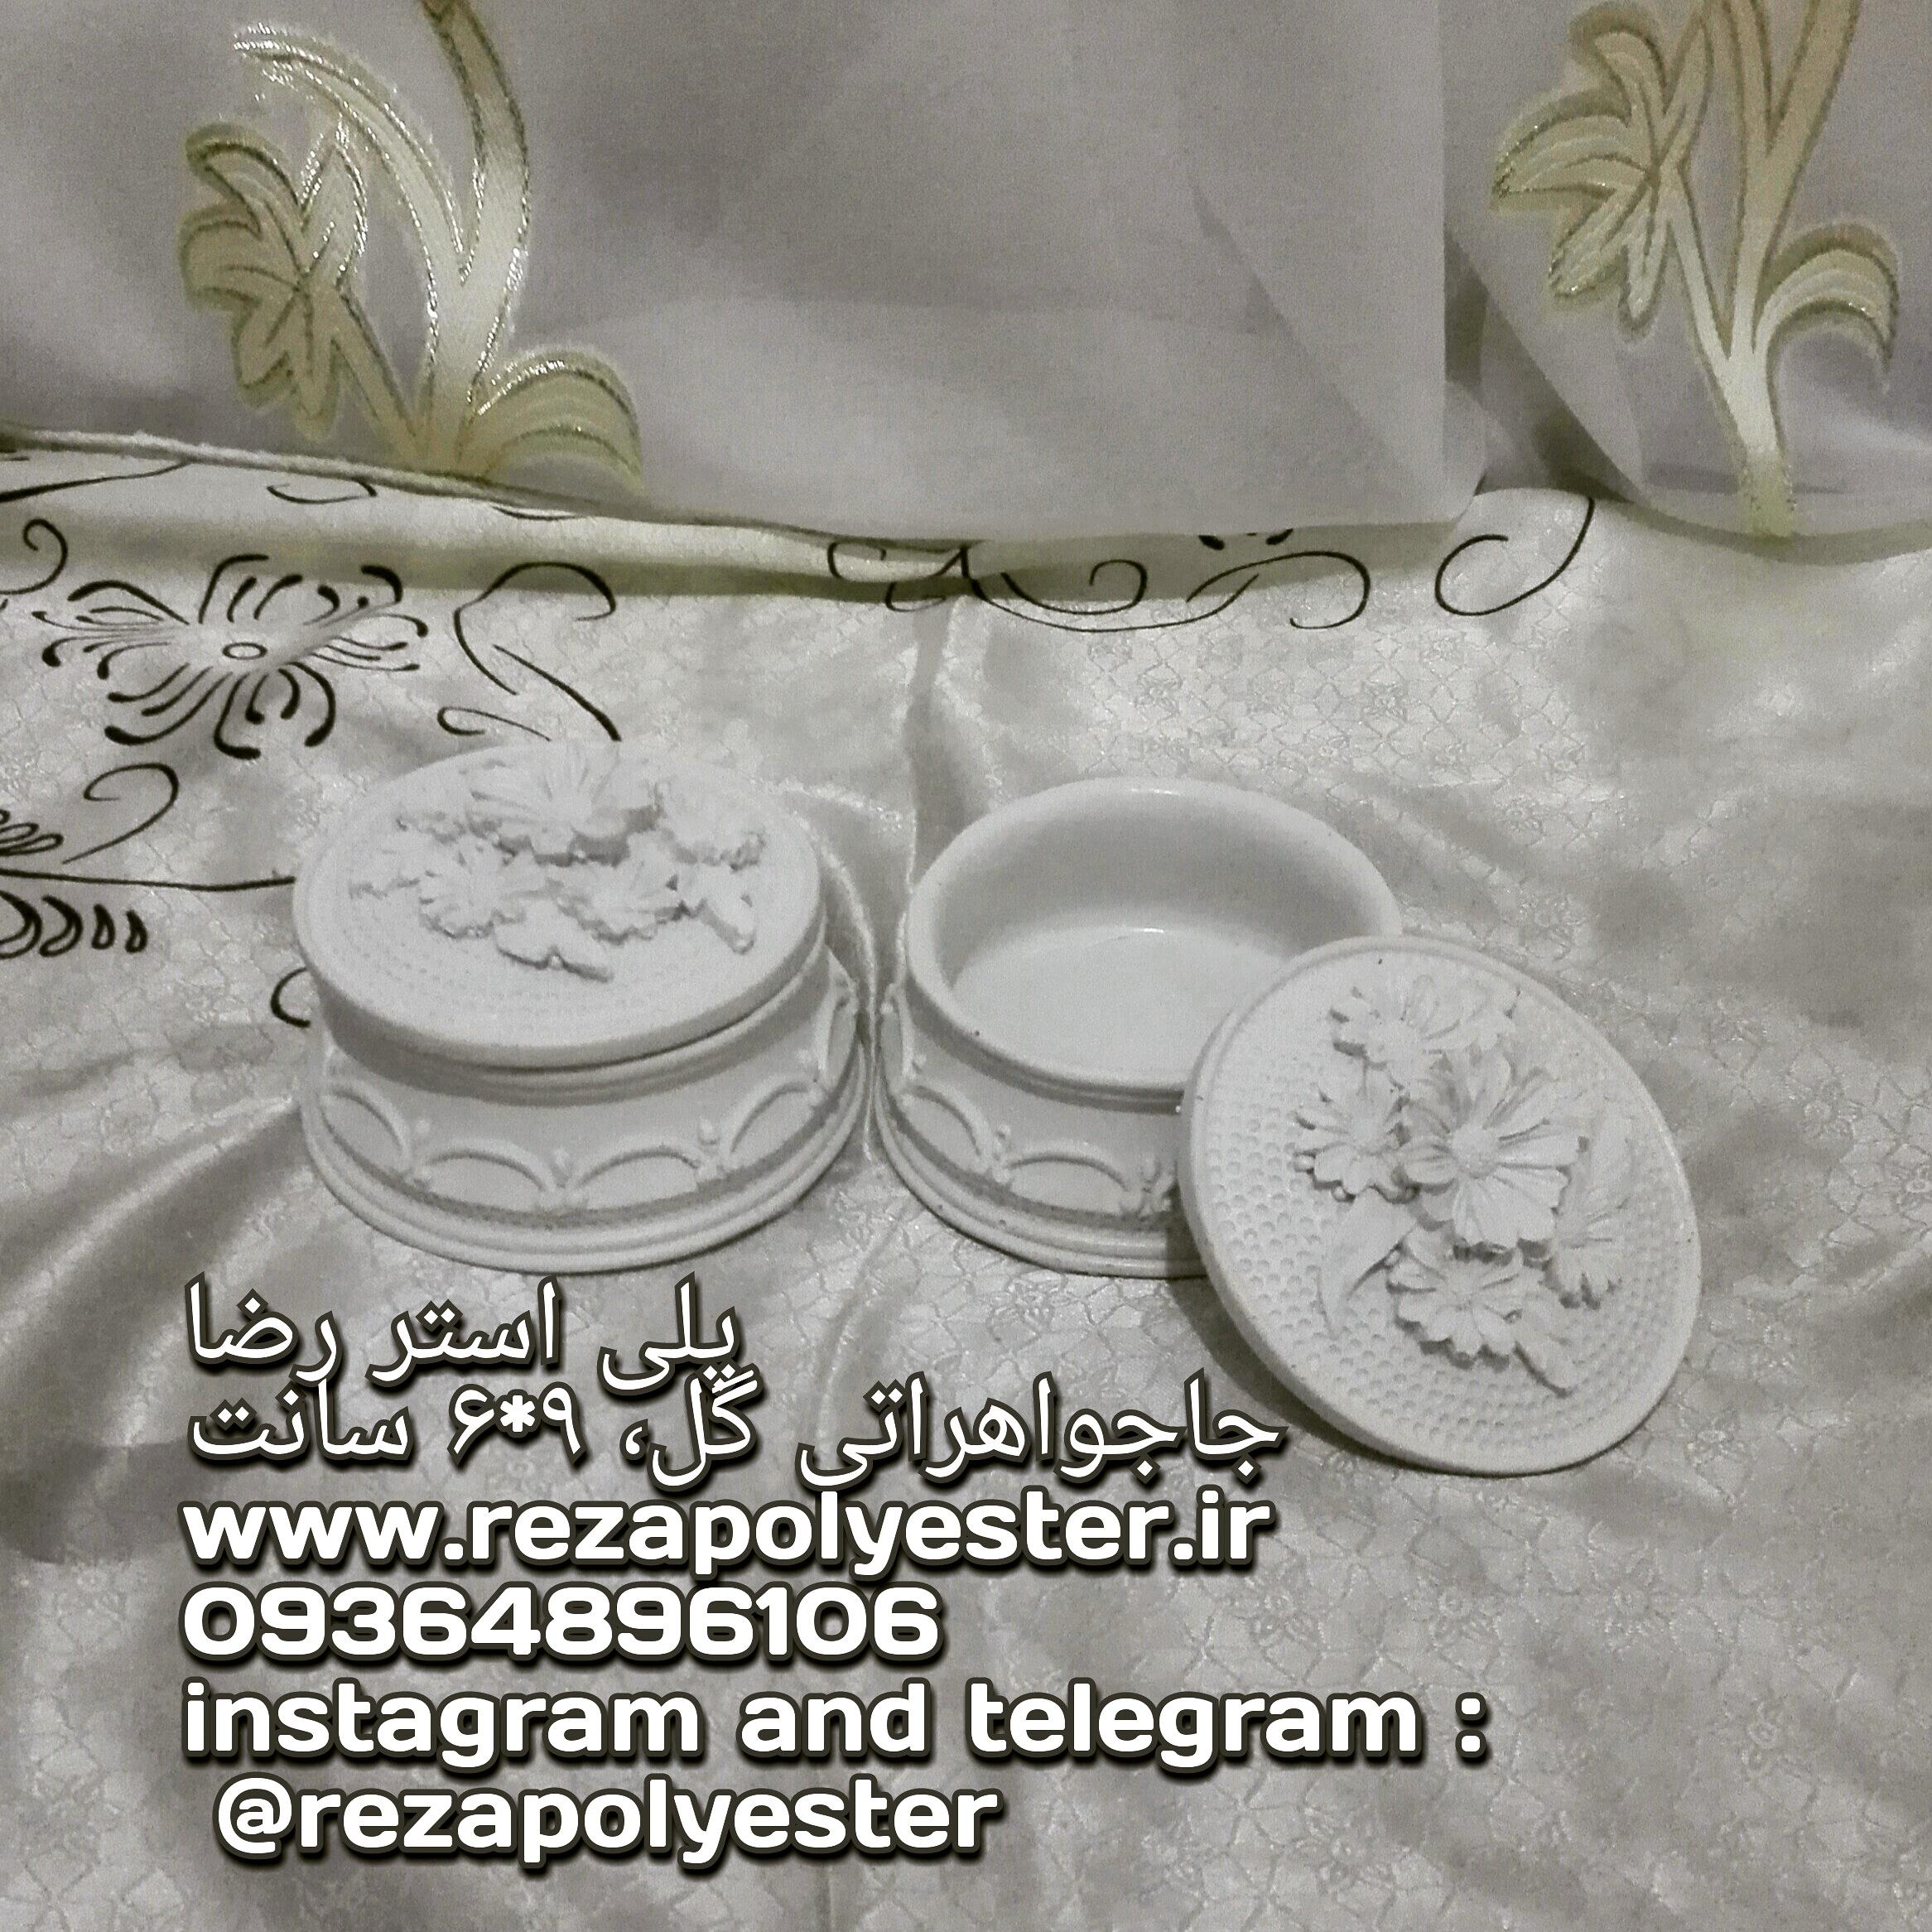 جاجواهراتی گل